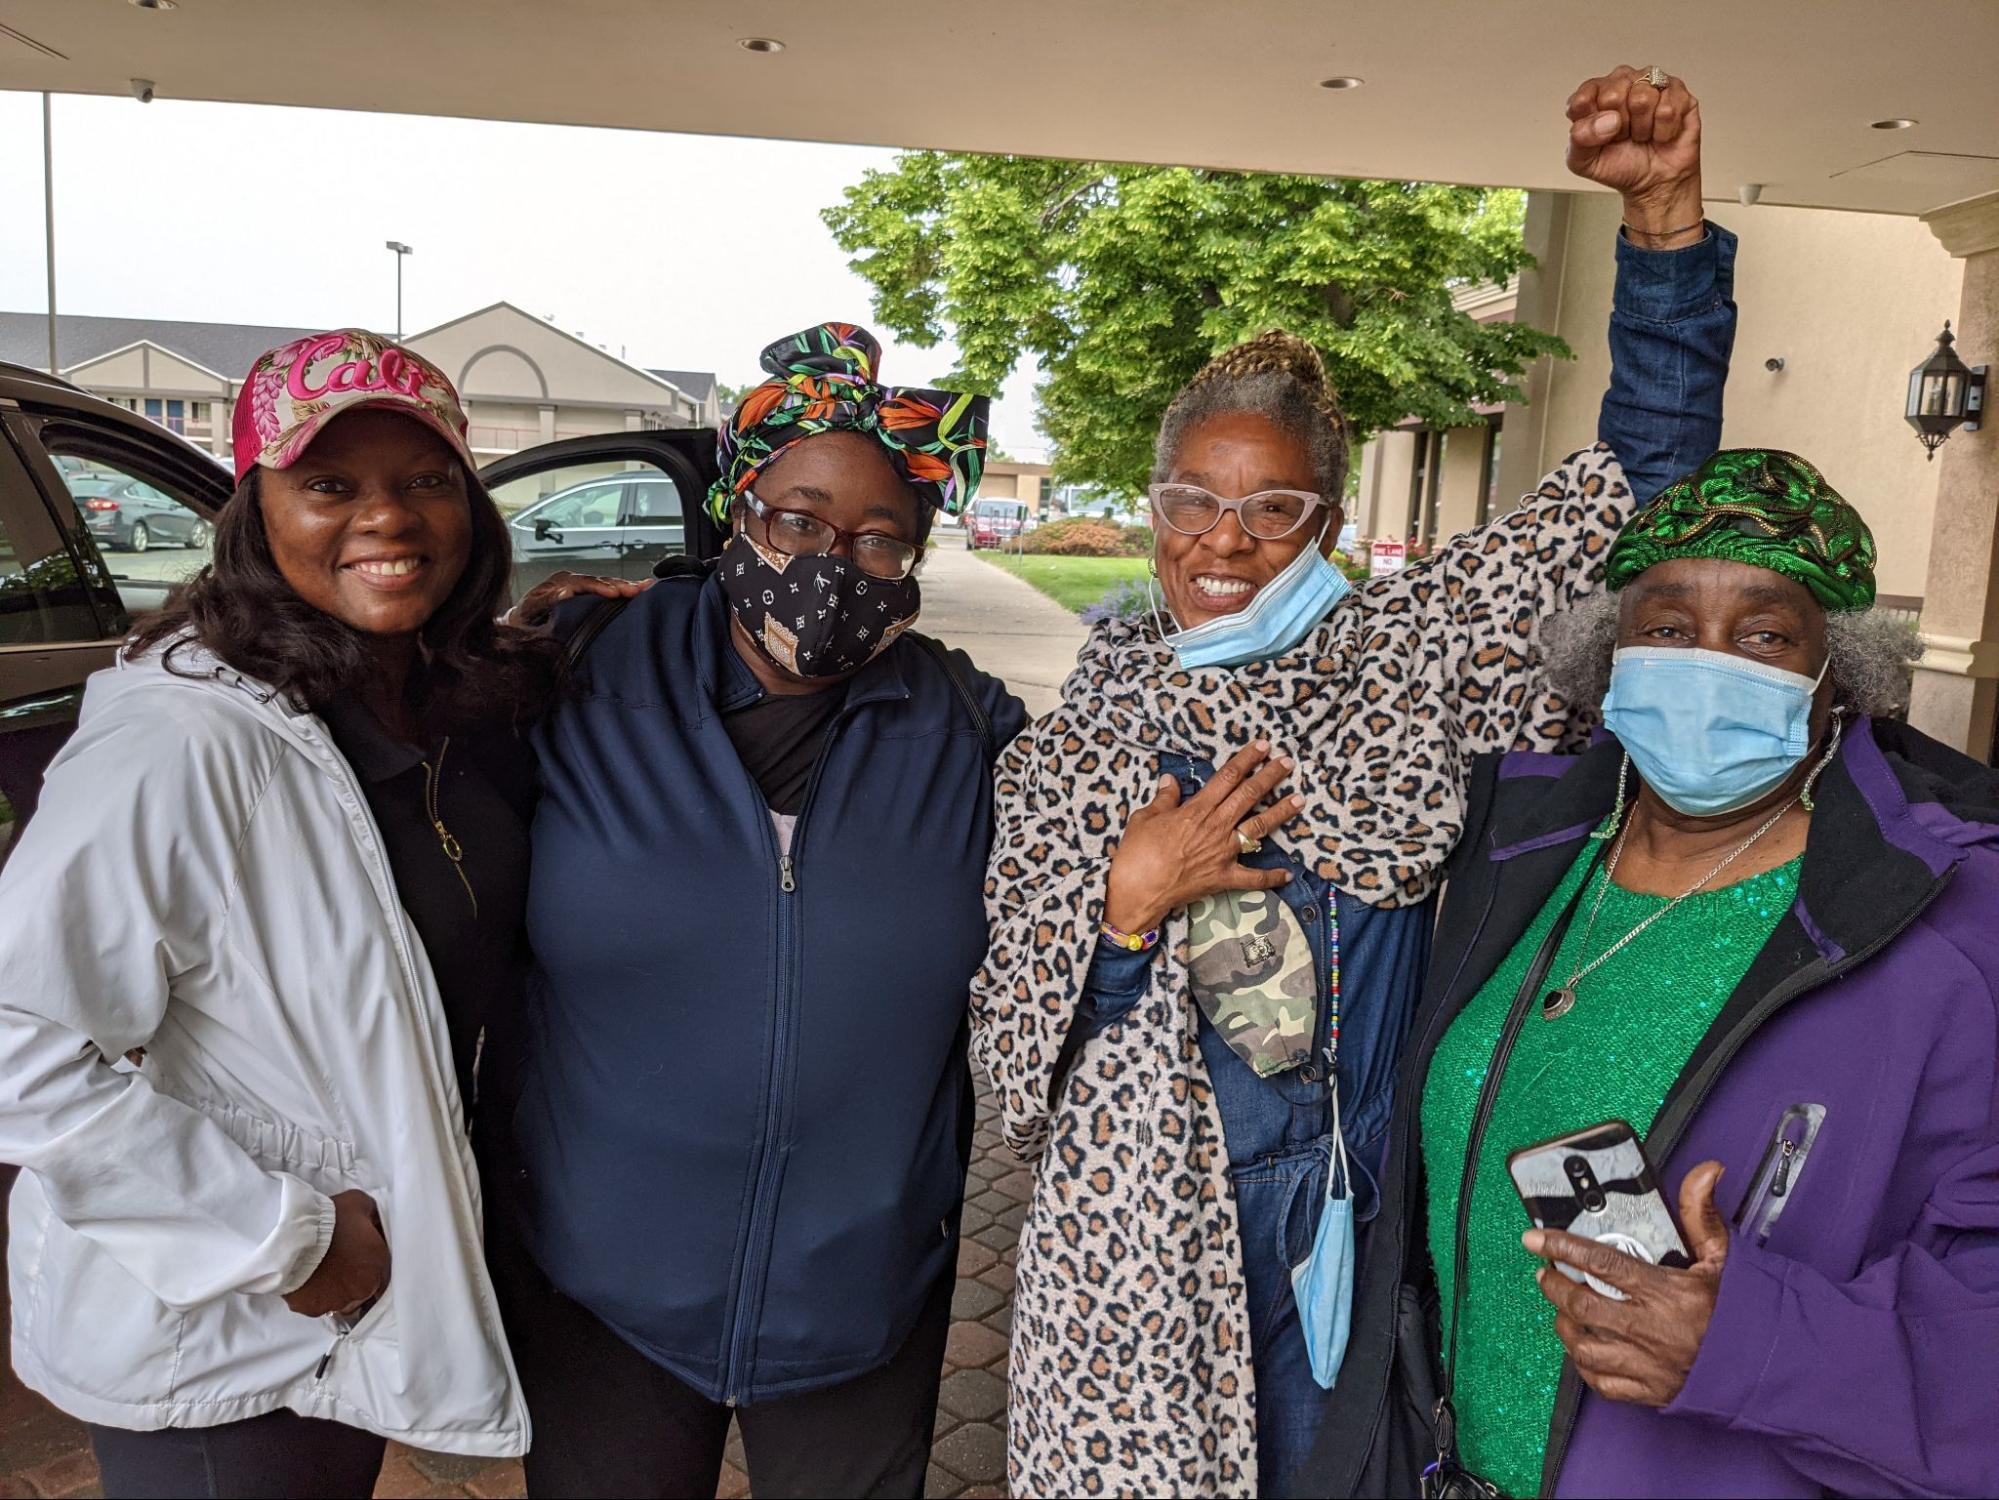 Grandmamas Robin Cole, Zerita Jones, Veronica Sance & Jessie Smith-Jones in Chicago